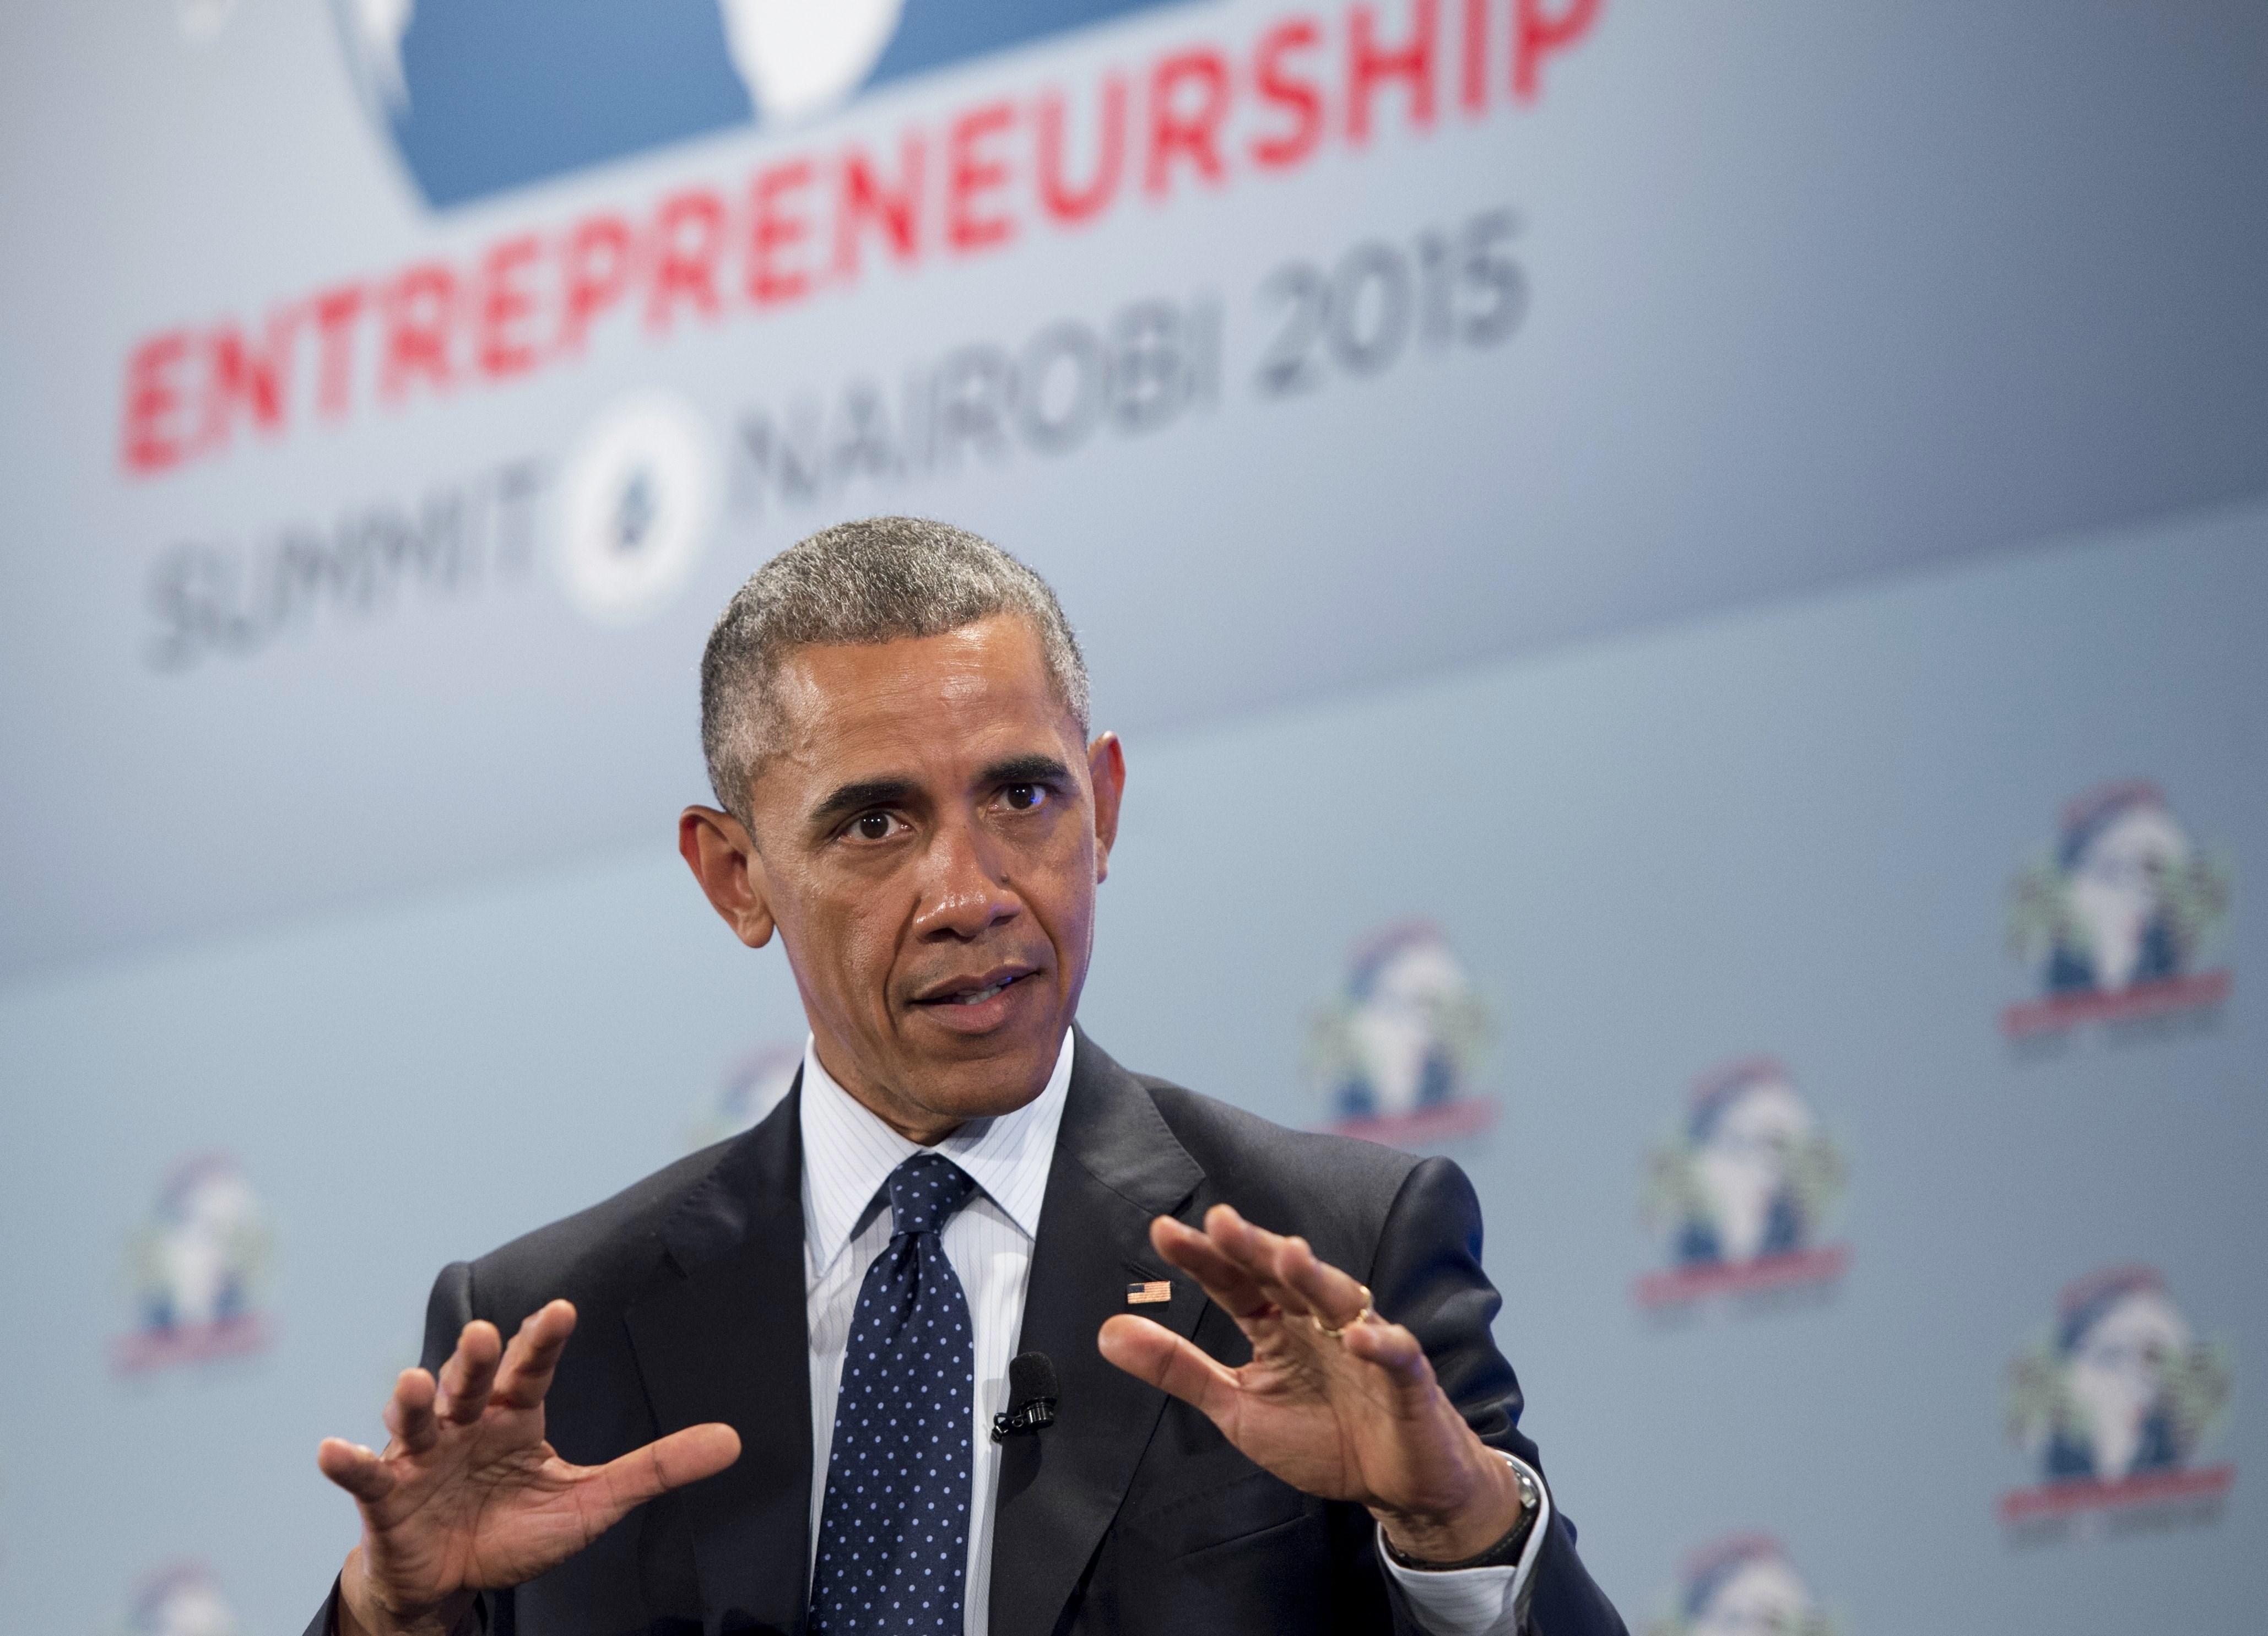 President Obama warns against getting 'cocooned' in bias via social media